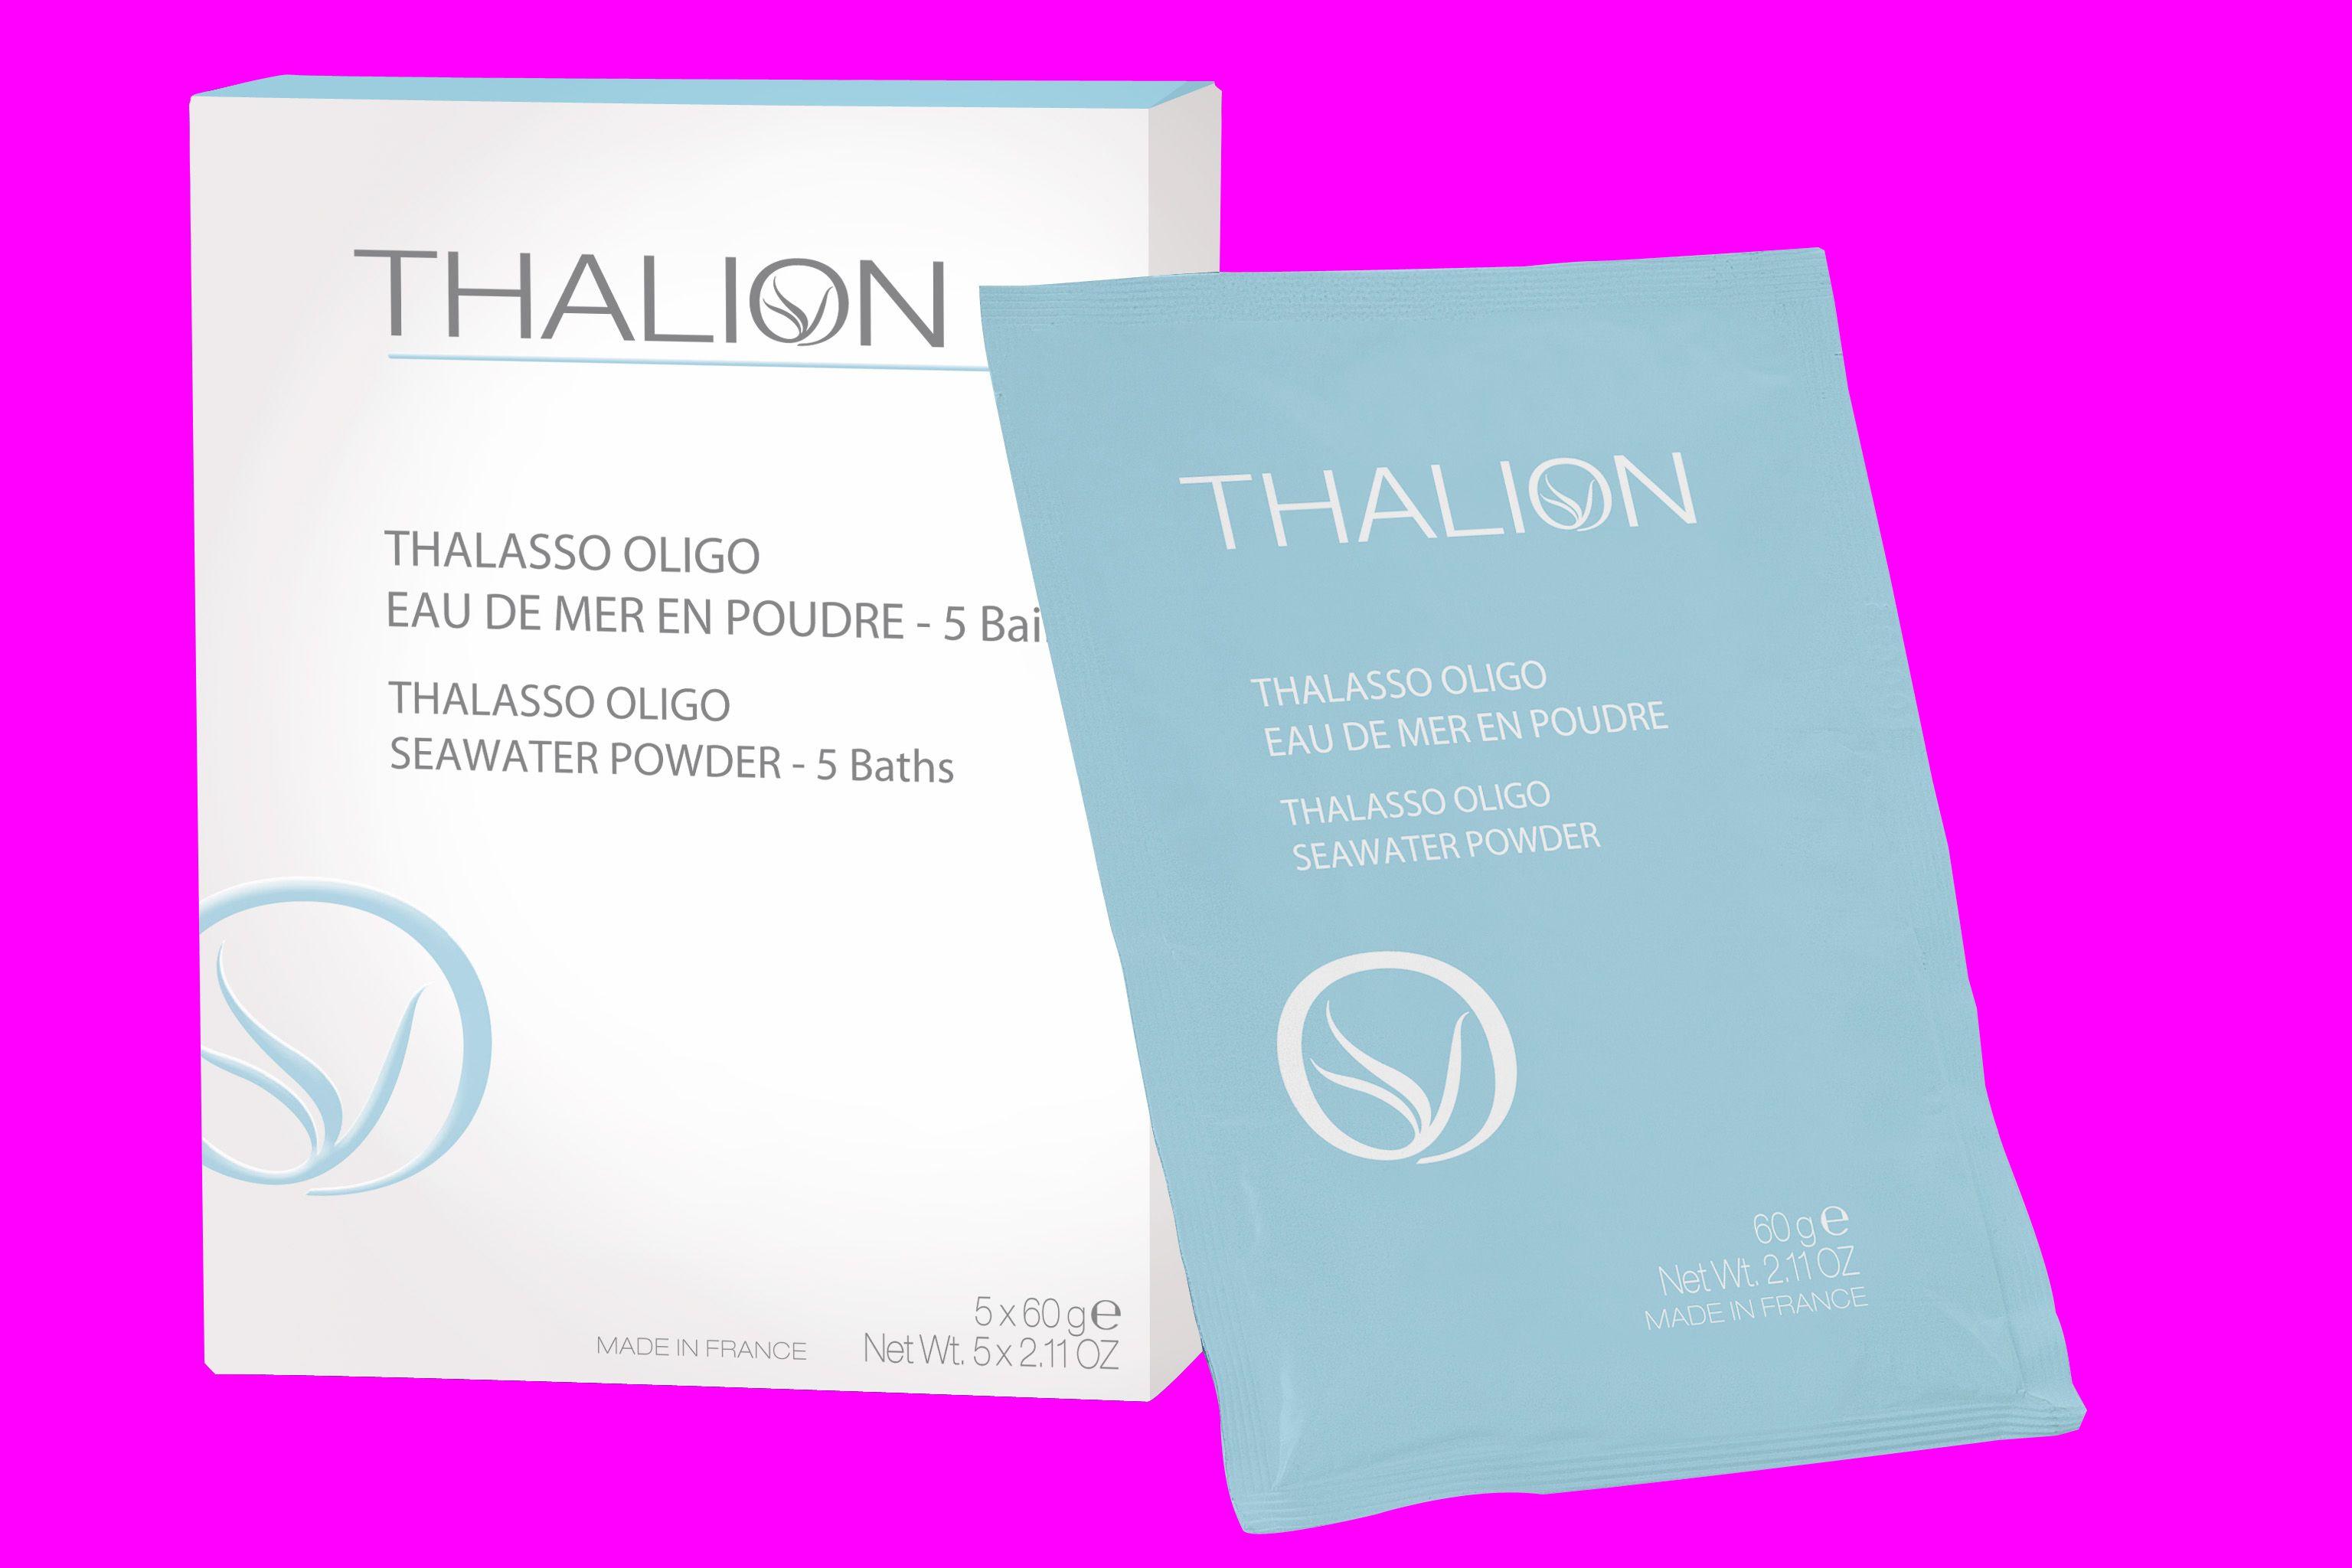 Thalion